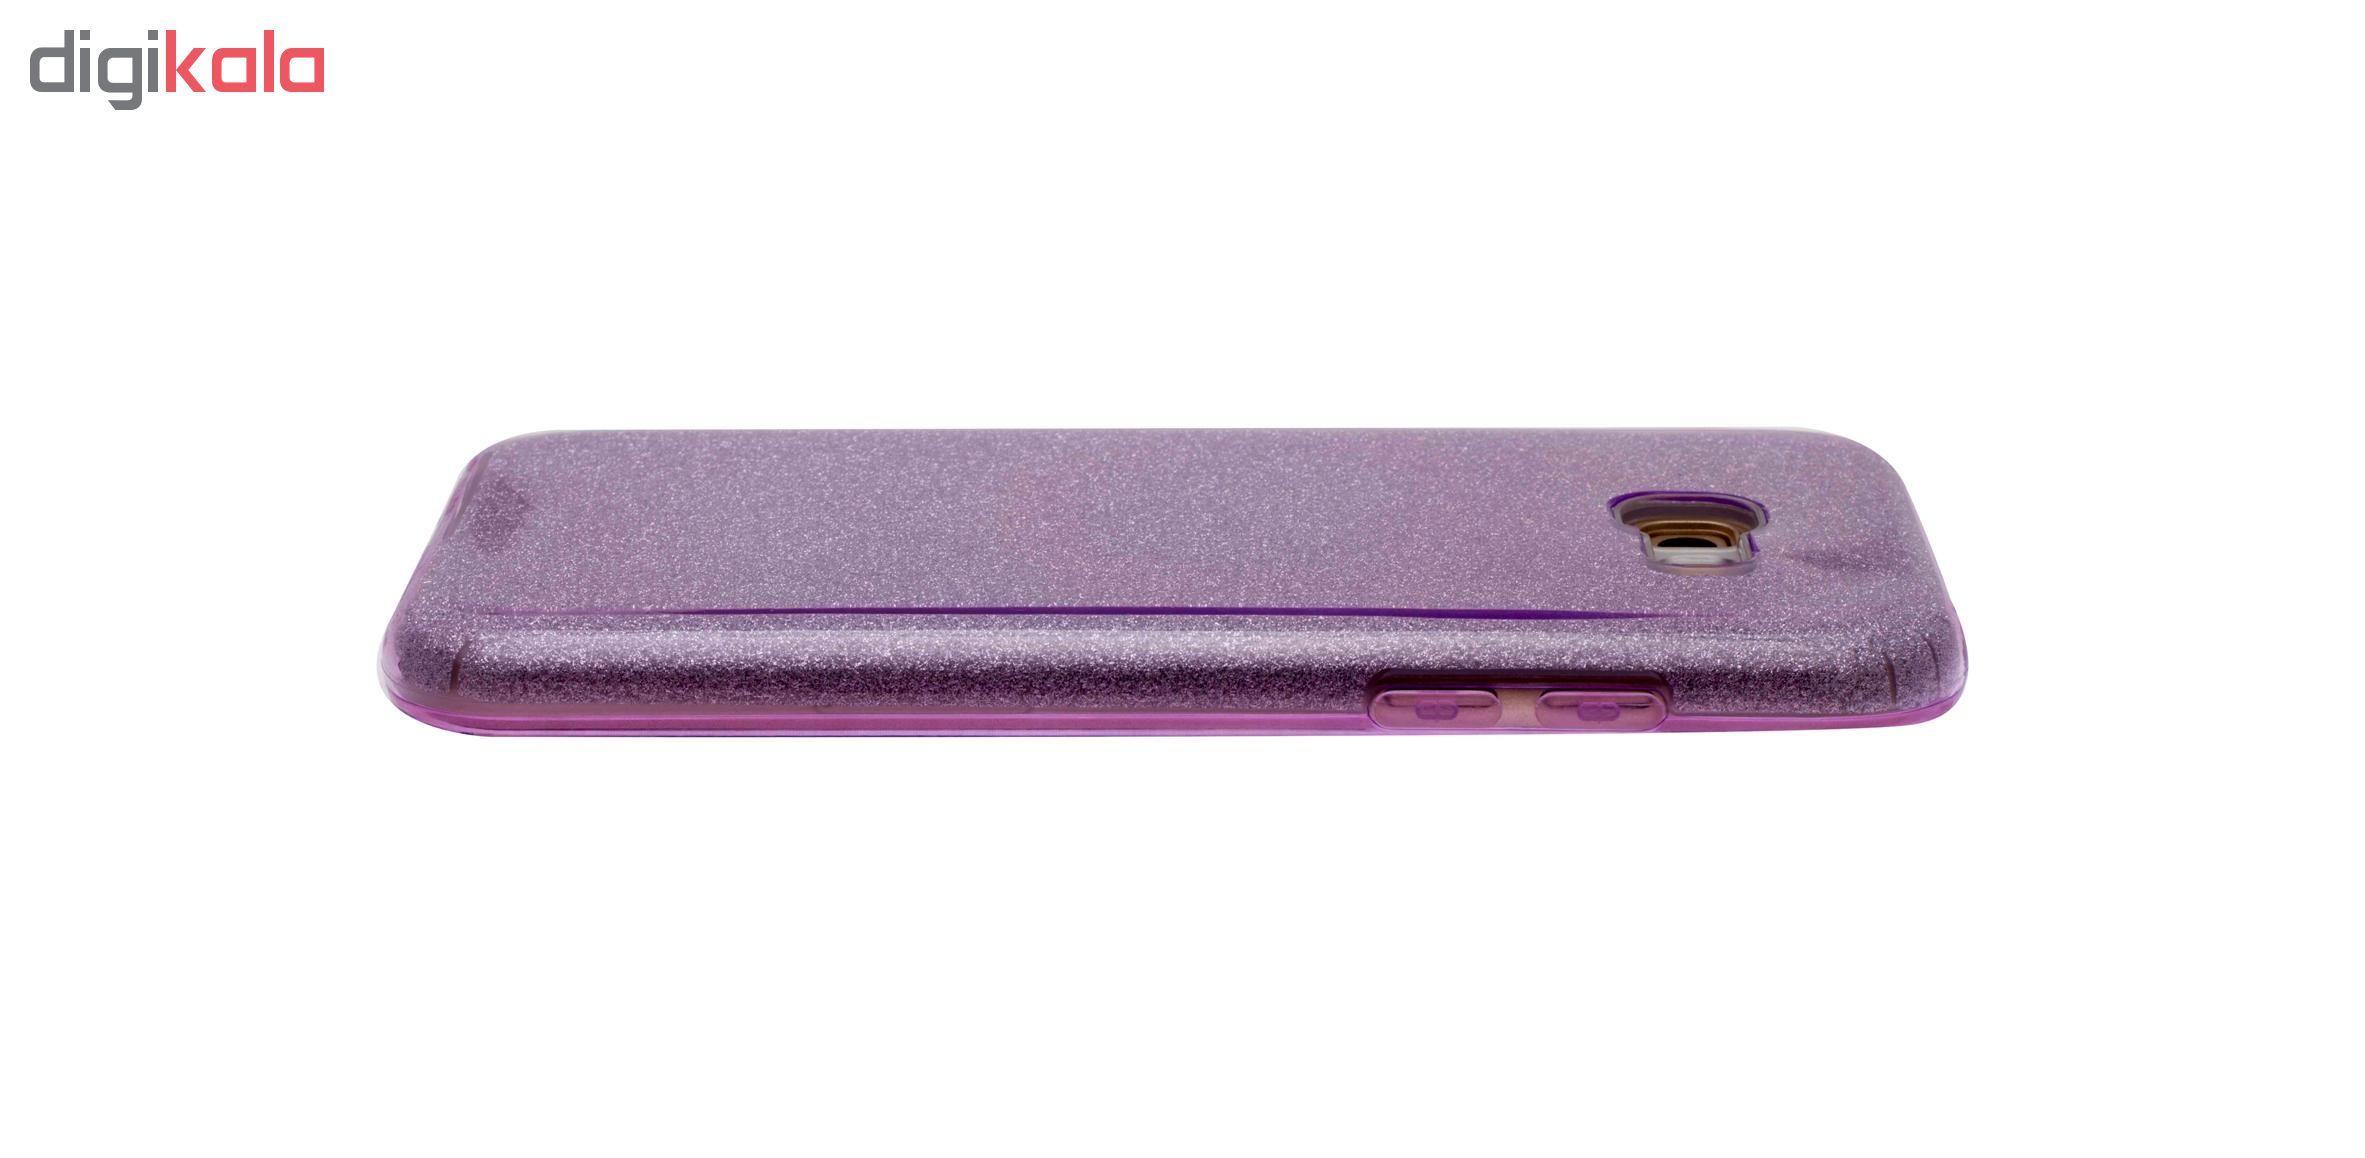 کاور مدل CORONA طرح اکلیلی مناسب برای گوشی سامسونگ گلکسی A5 2017 / A520 main 1 12